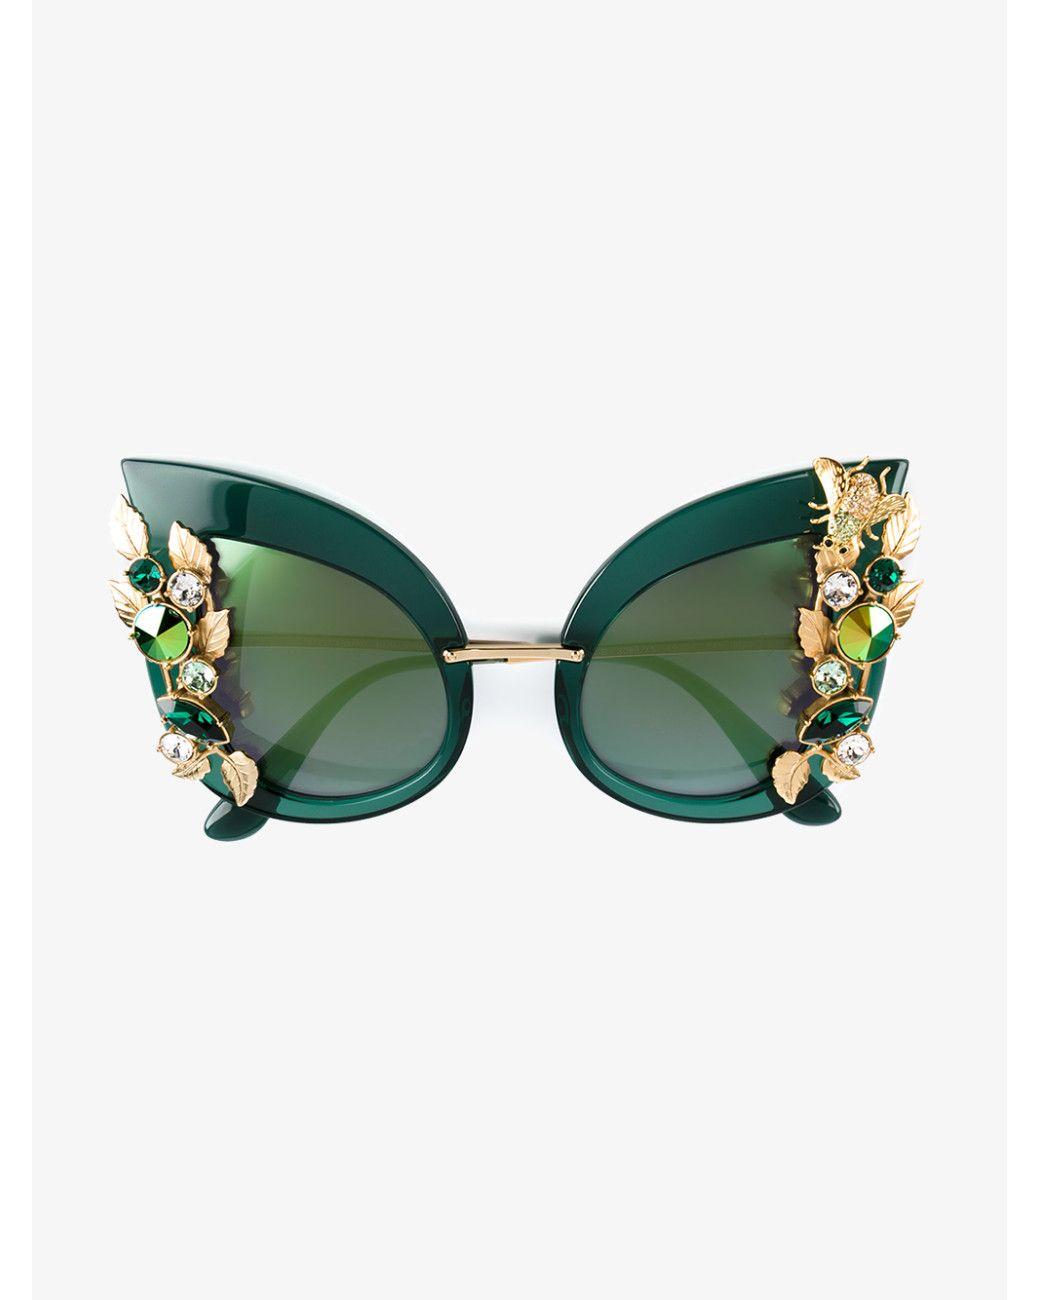 Dolce Gabbana Black Crystal Embellished Sunglasses Aksesoris Kaca Mata Mata